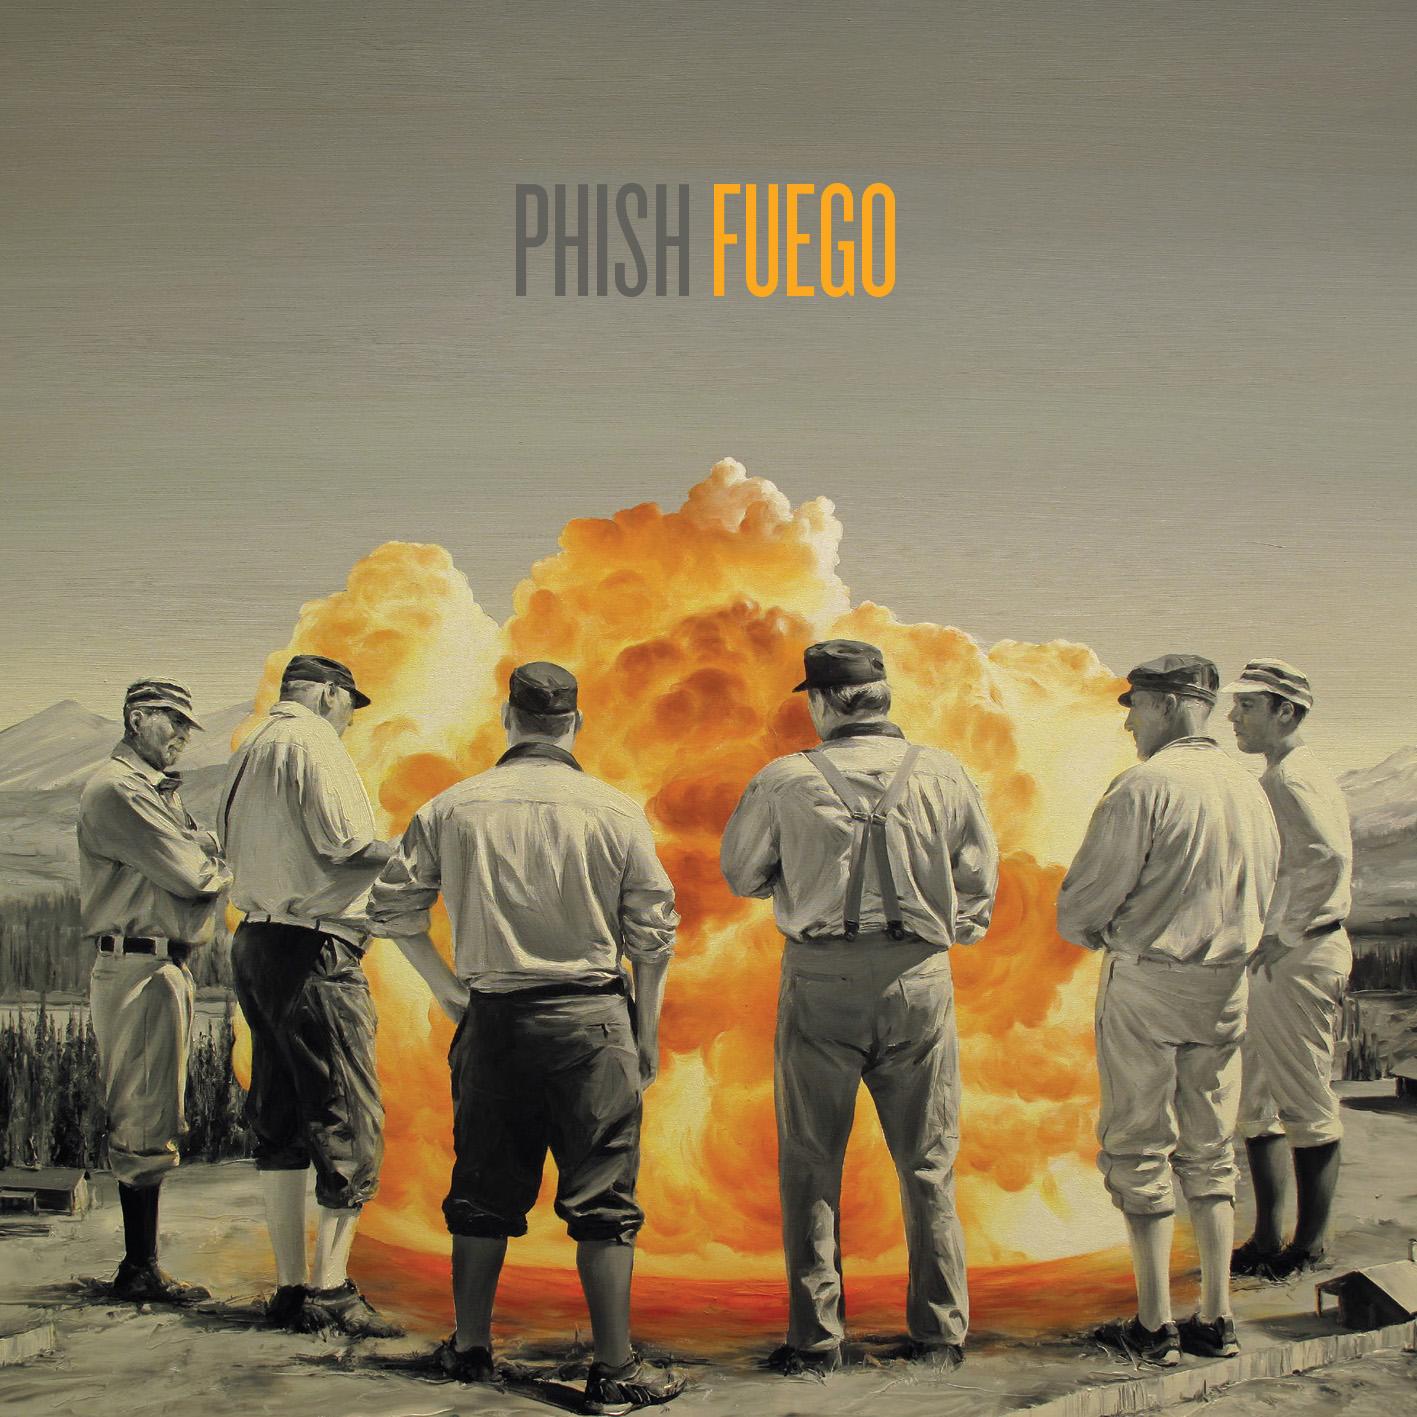 Phish_Fuego_CD_cover.jpg